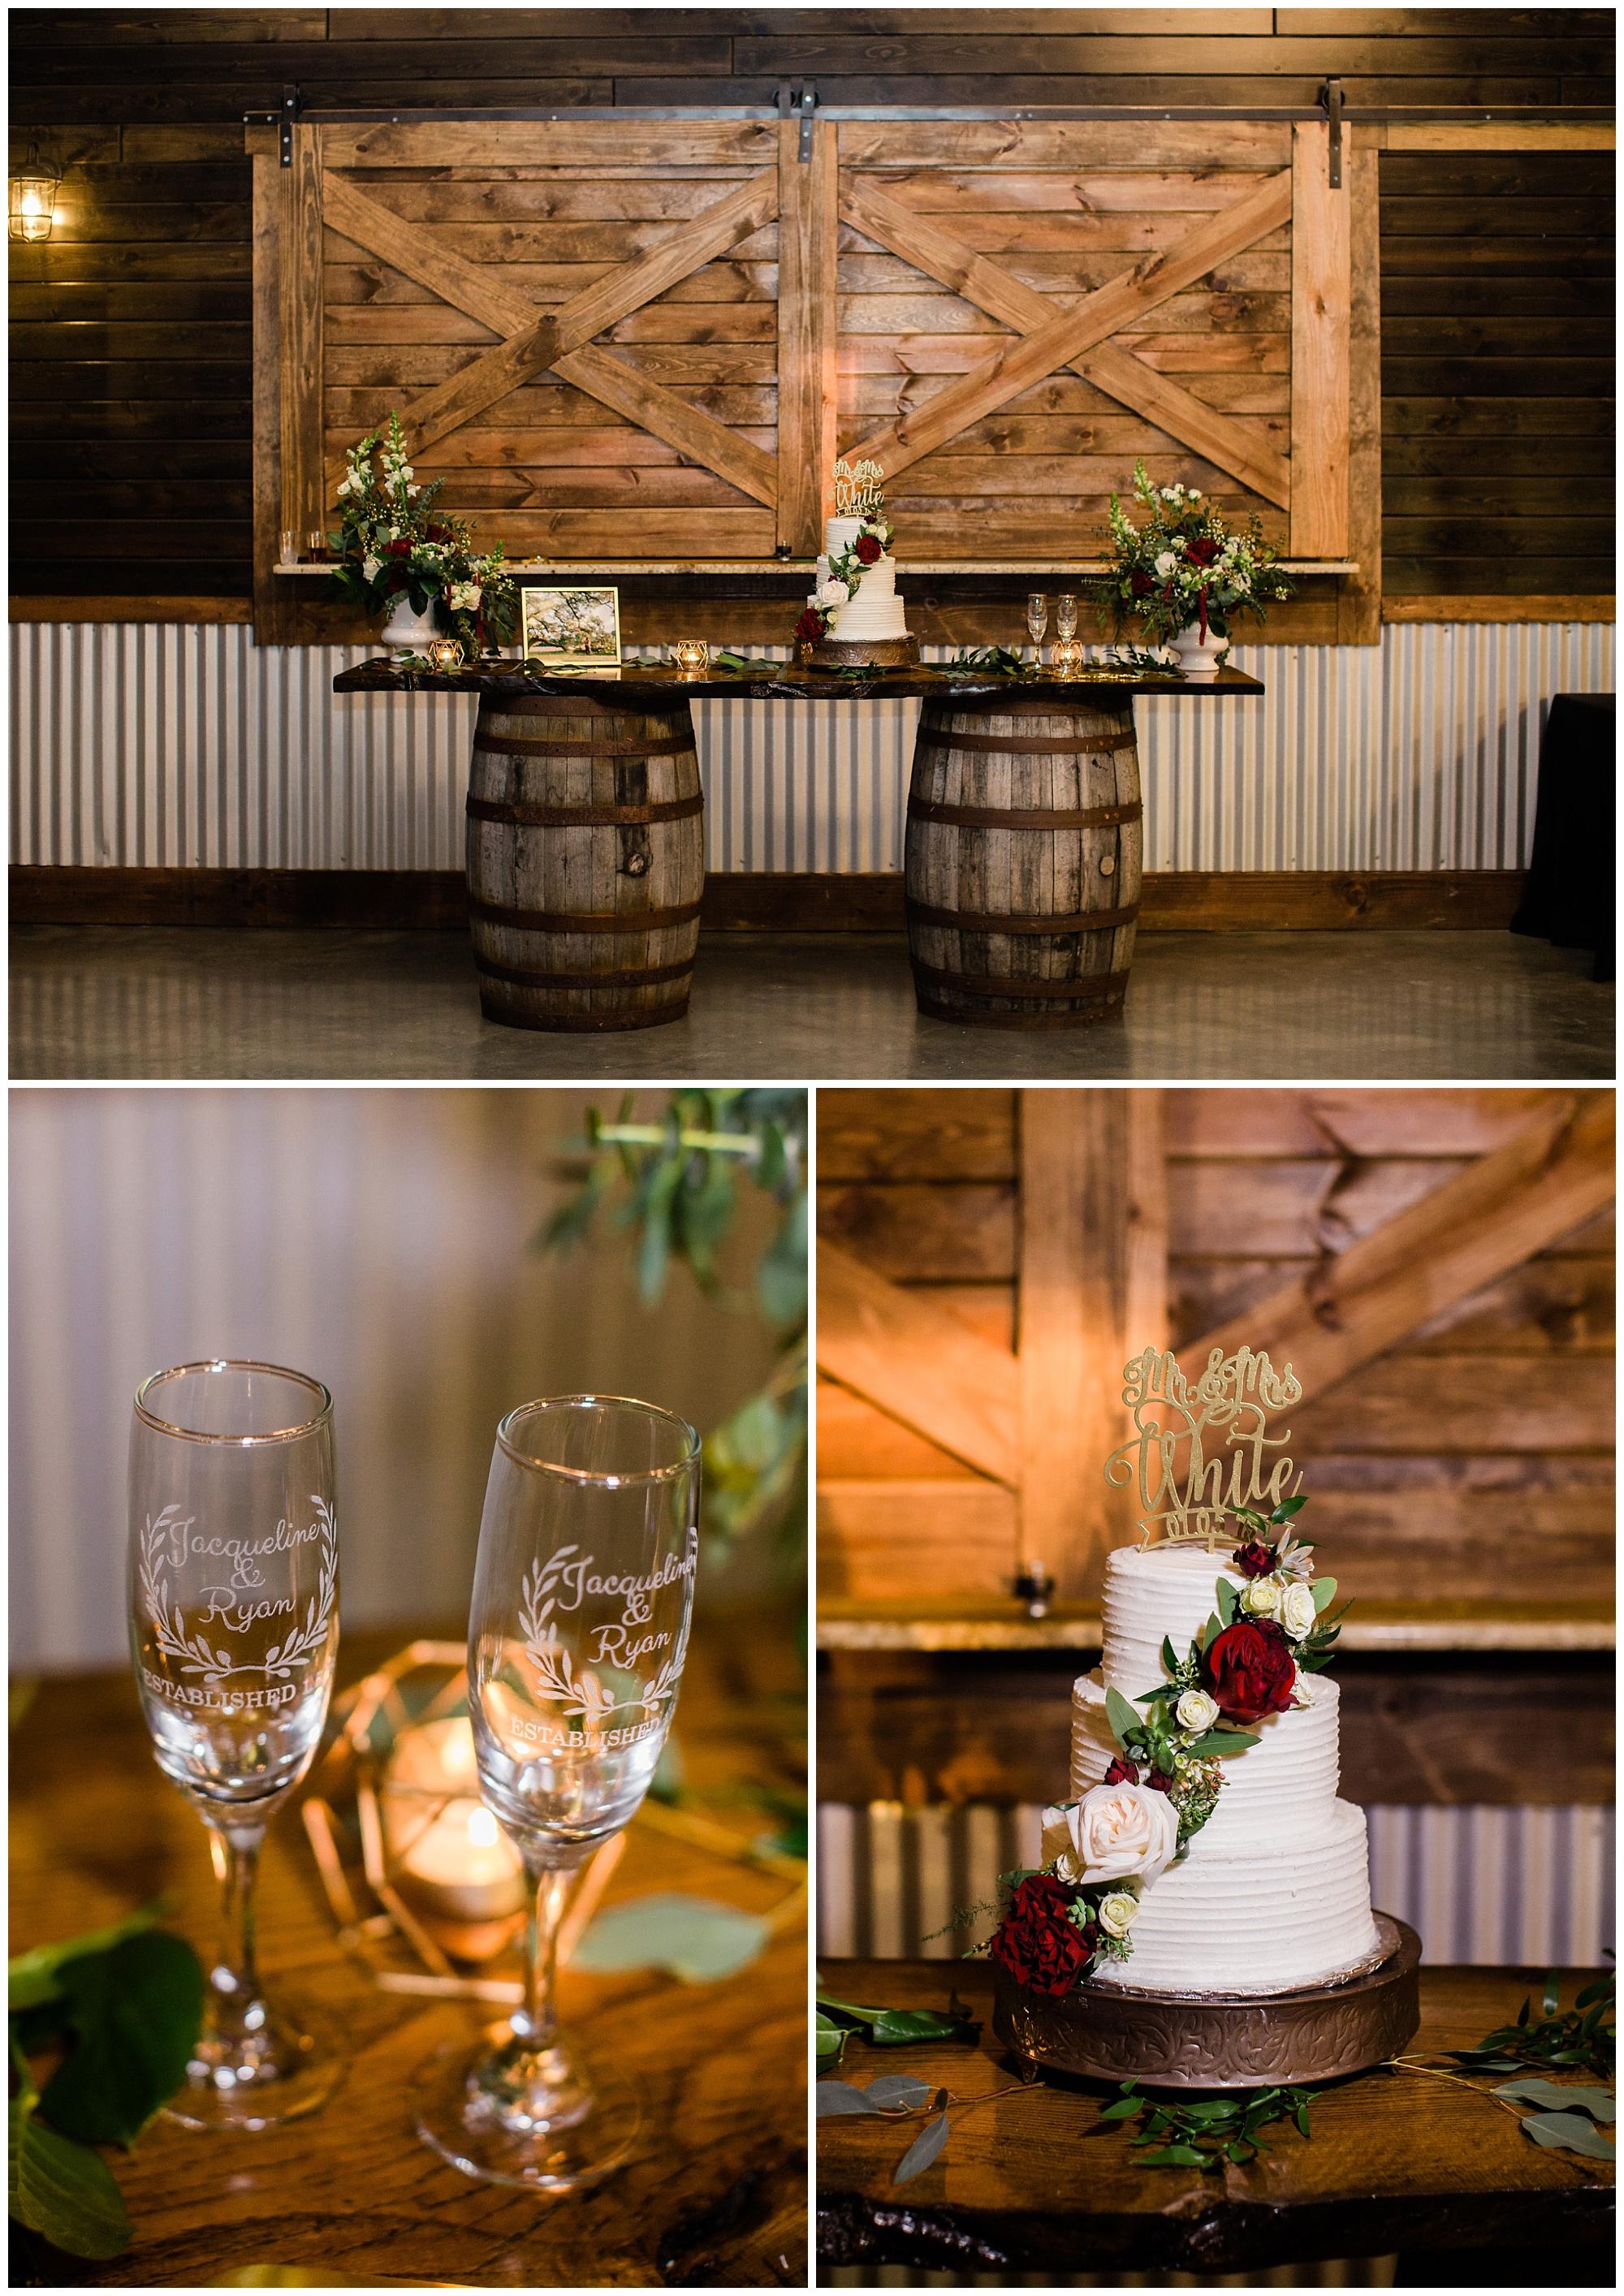 Peach_Creek_Ranch_Wedding_Kristina_Ross_Photography_0025.jpg